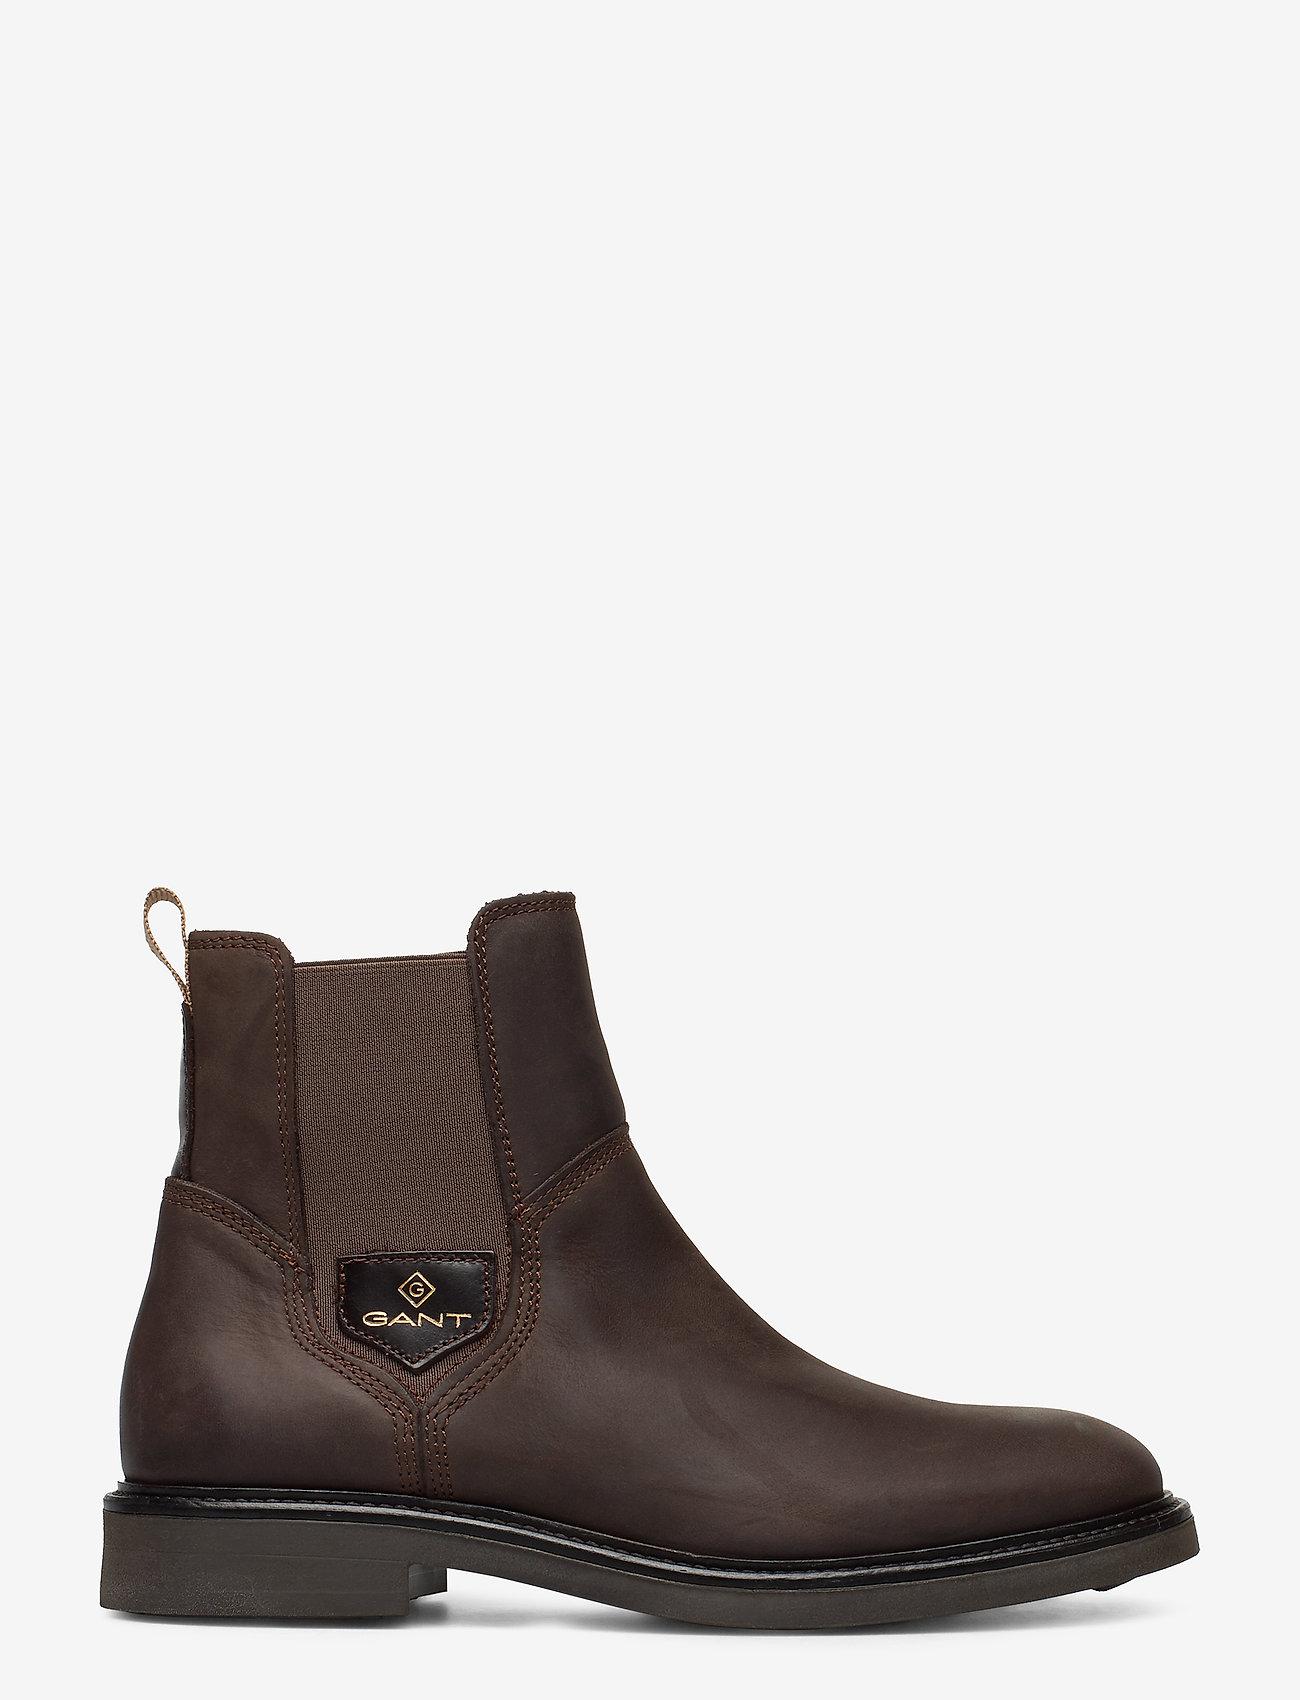 GANT - Ashleyy Chelsea - chelsea boots - dark brown - 1